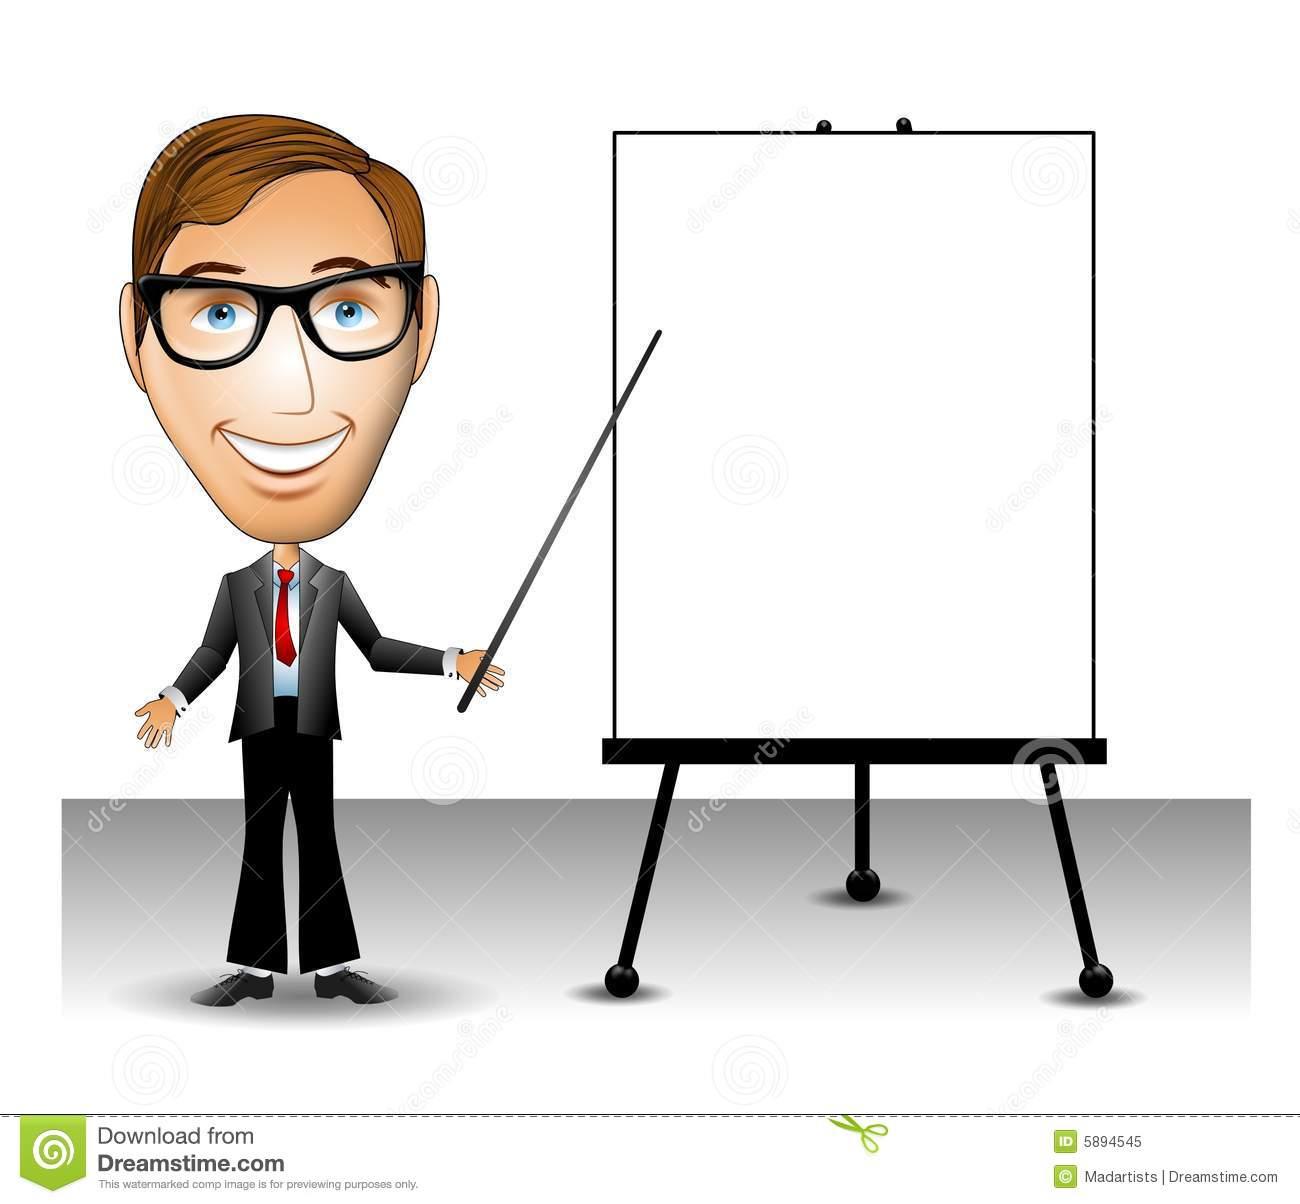 presentation clipart. presentation clipart. presentation clipart. presentation clipart